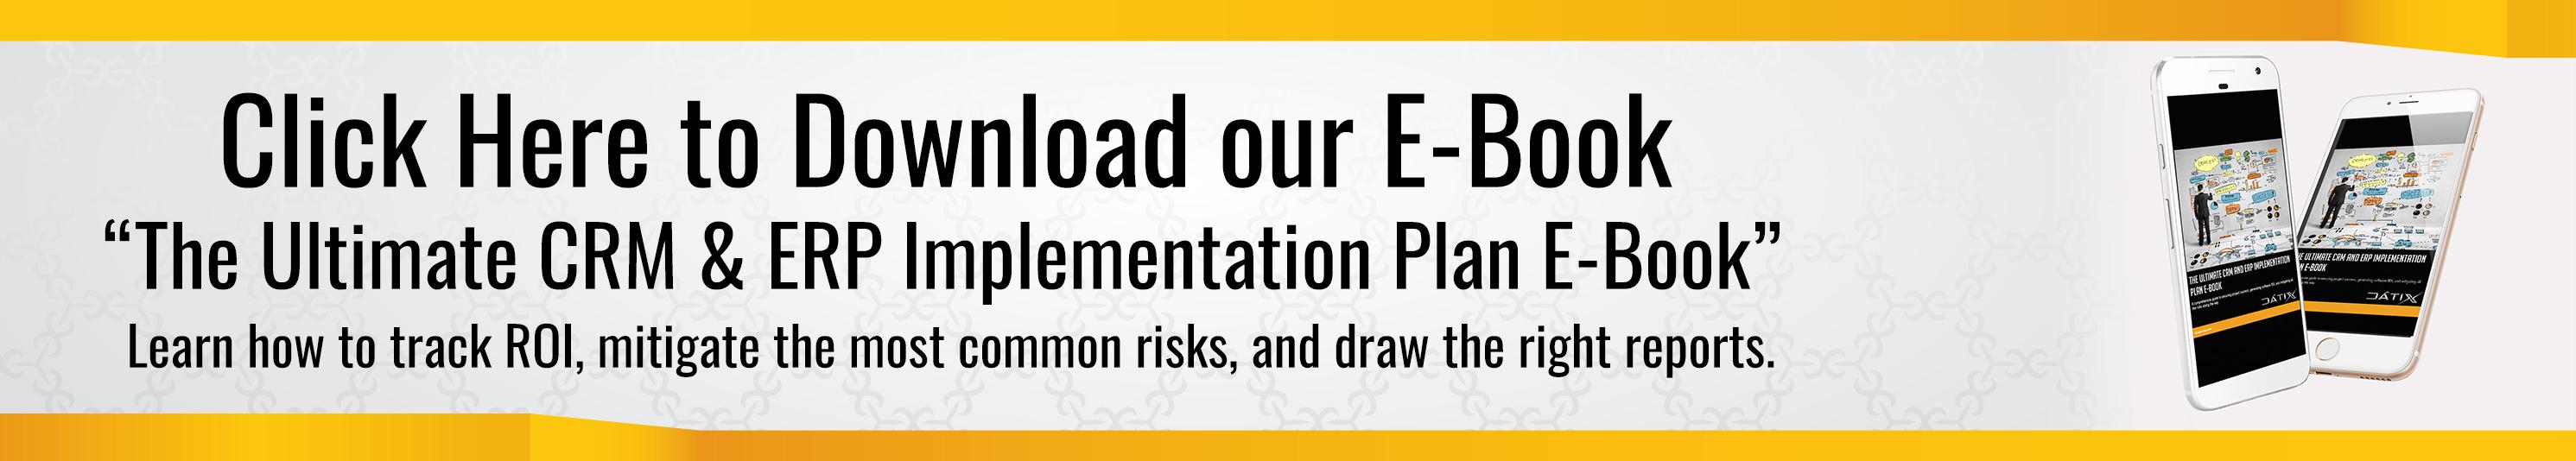 CRM ERP Implementation E-Book